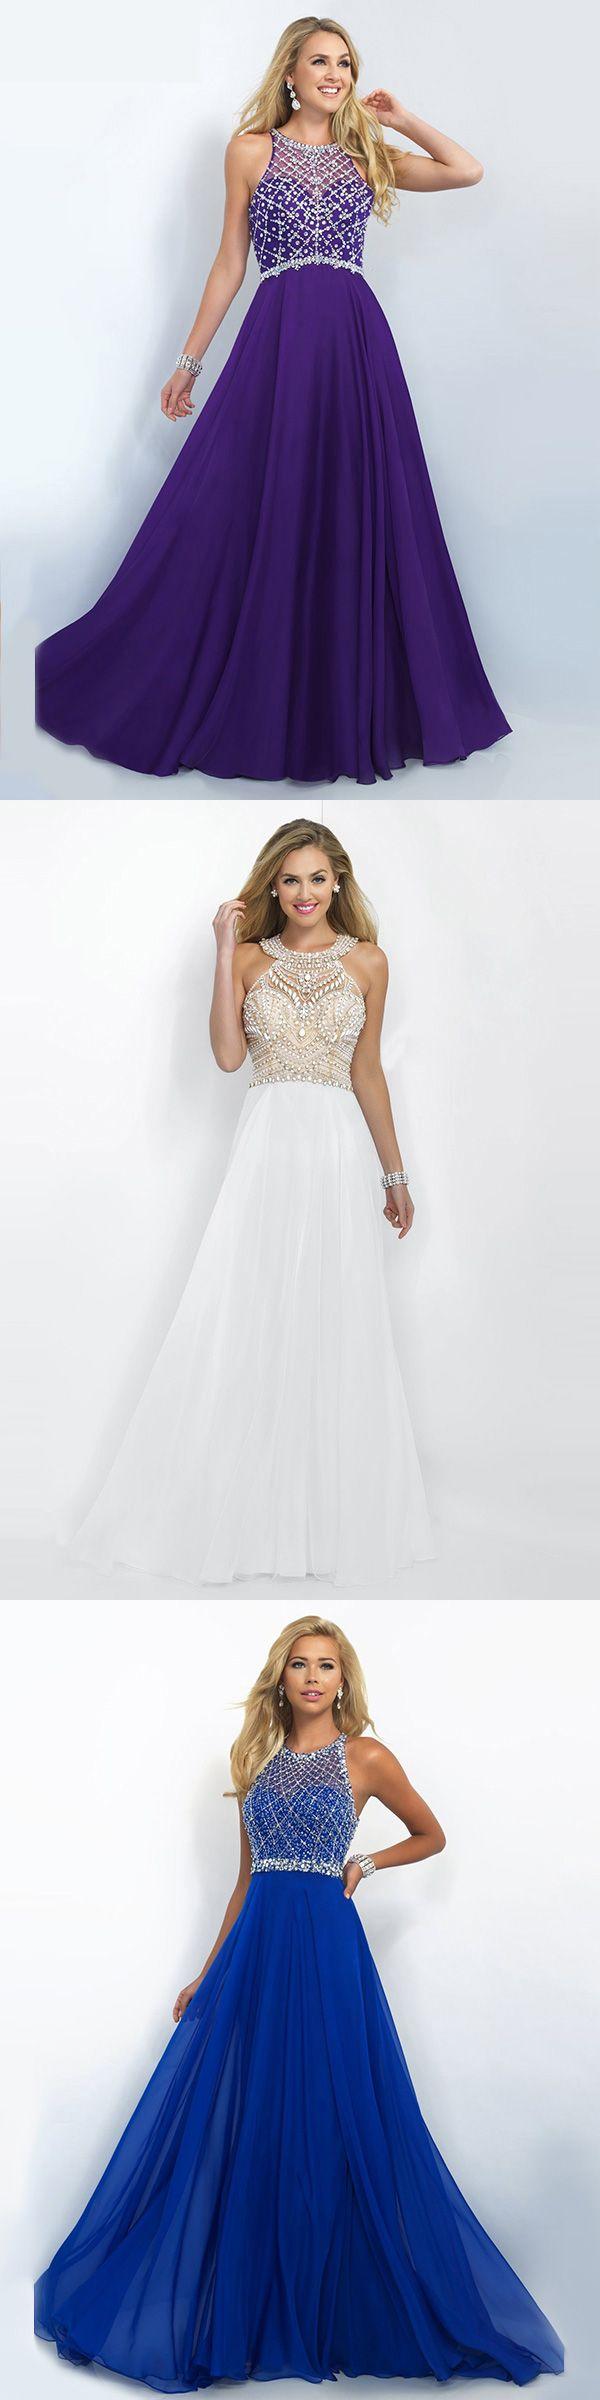 new styles of prom dresses via promwill dresses